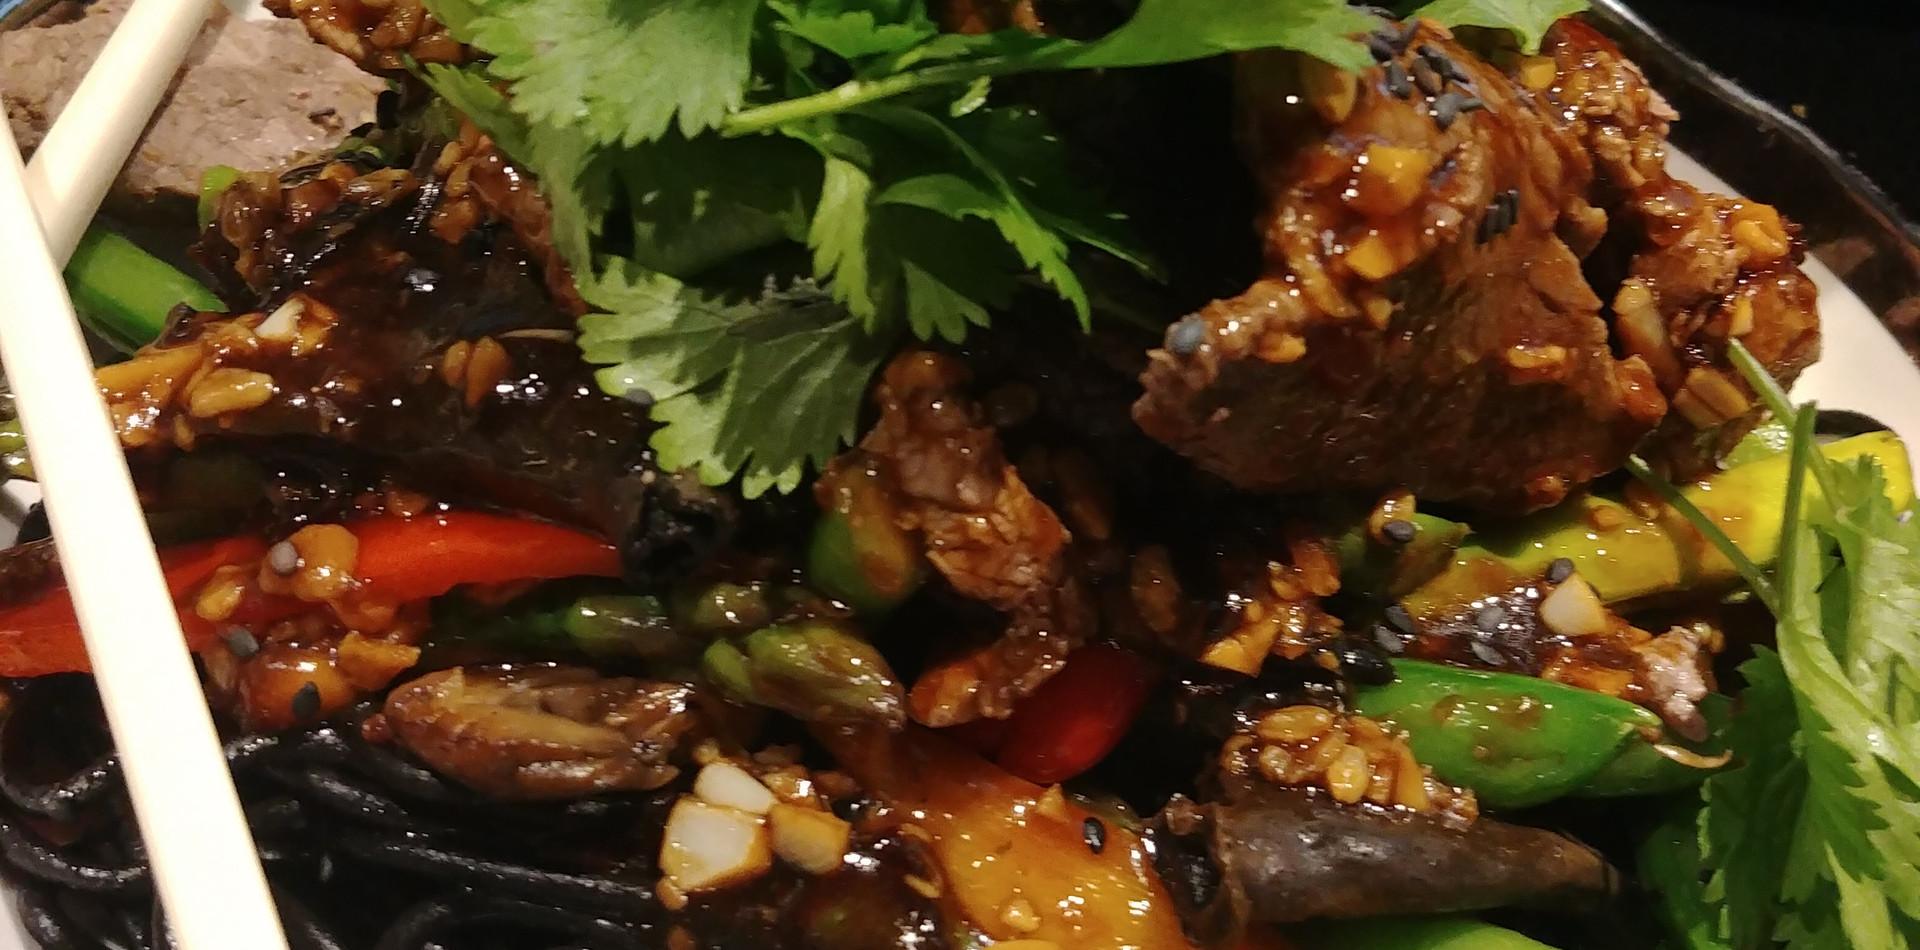 Mushroom Asparagus and Snap Pea Stir Fry with Miso Tamari Sauce